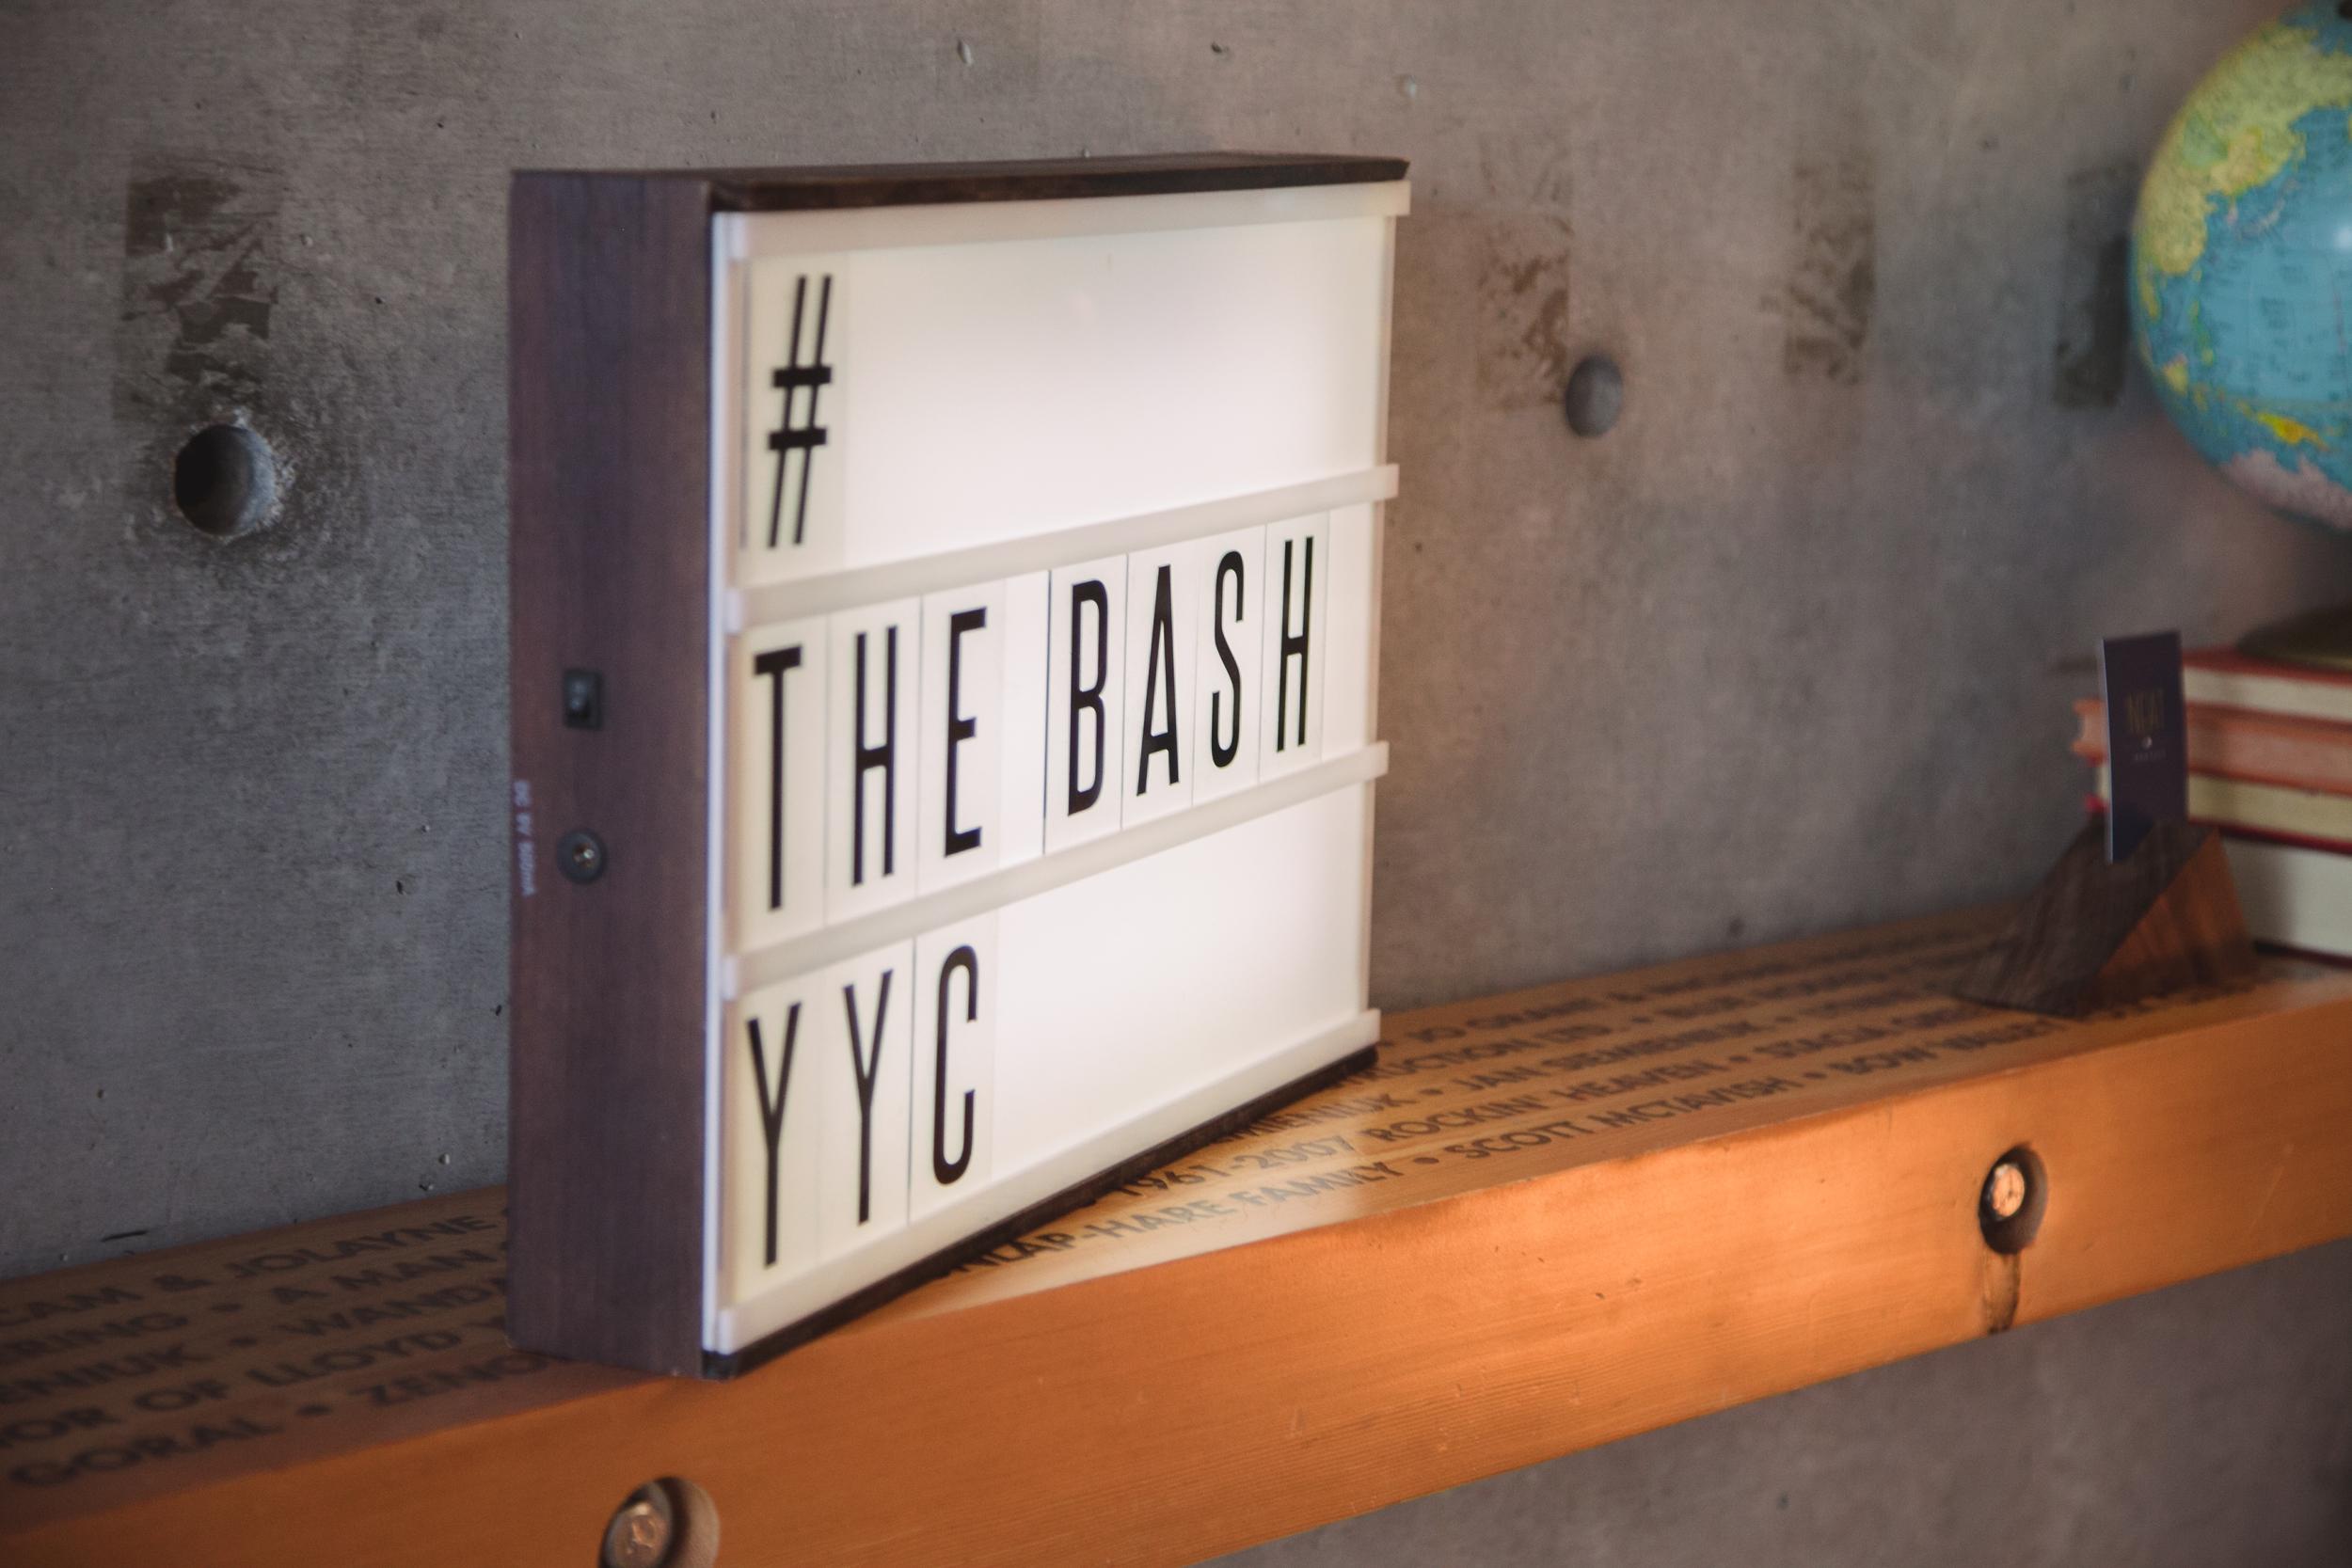 Neat Rentals light box at The Bash